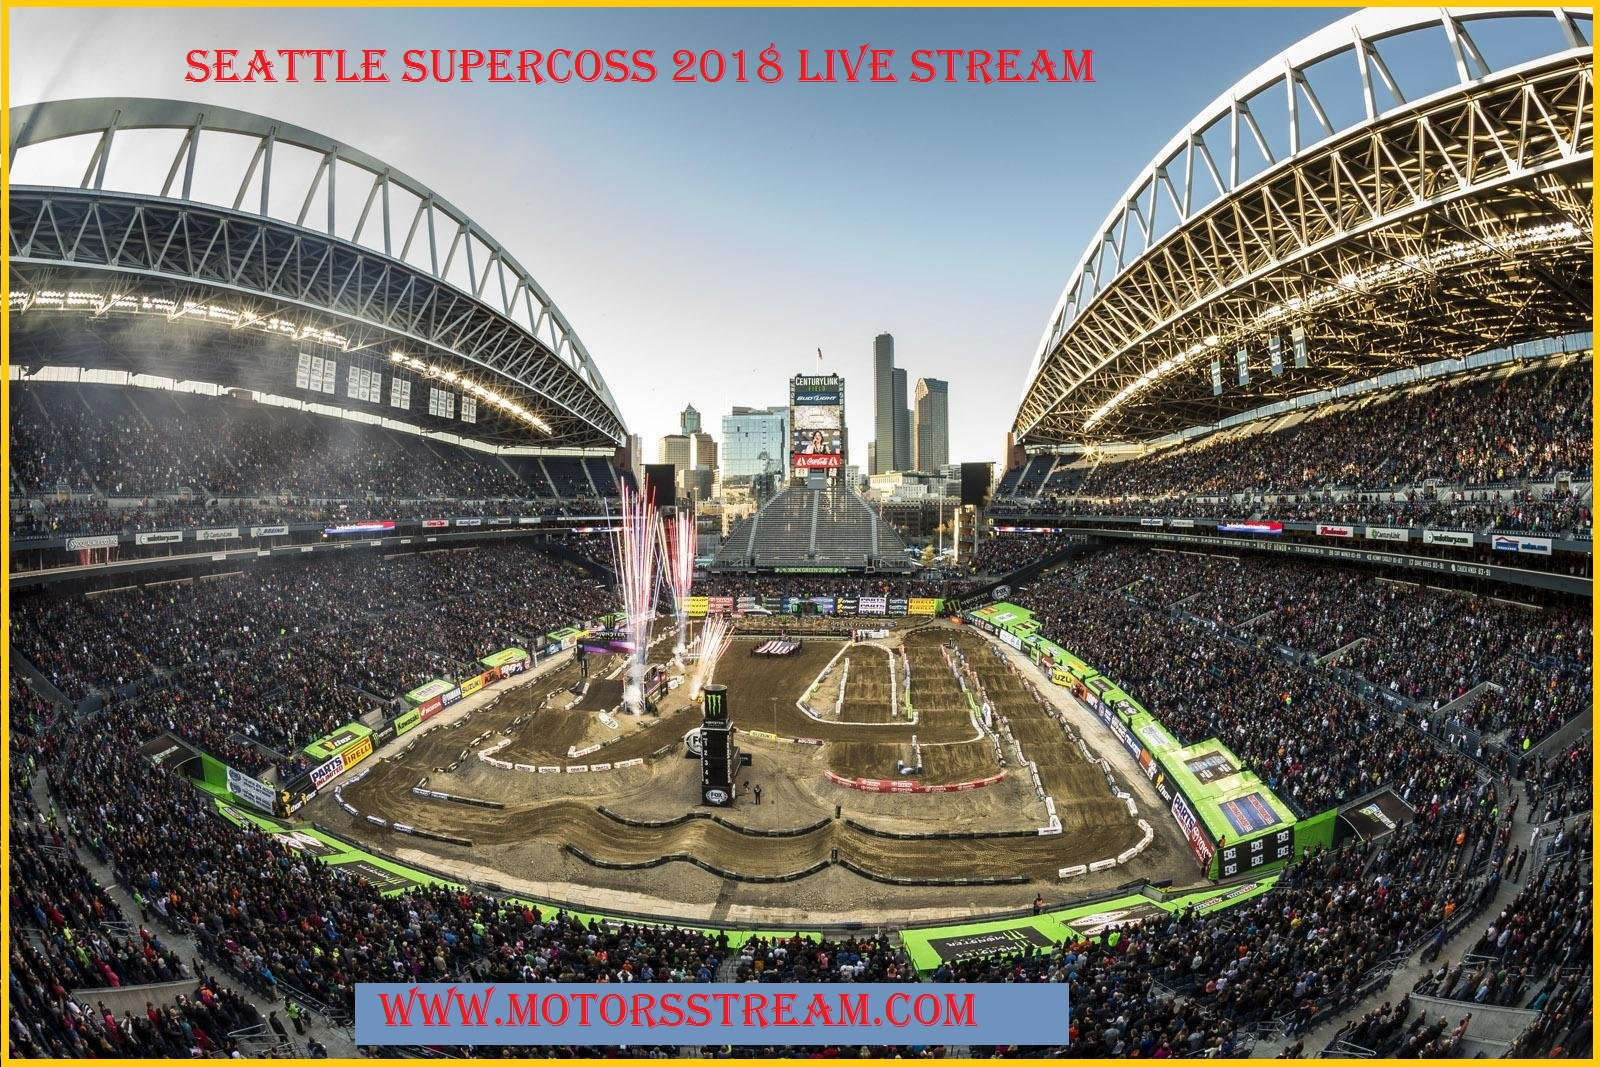 Supercross seattle 2018